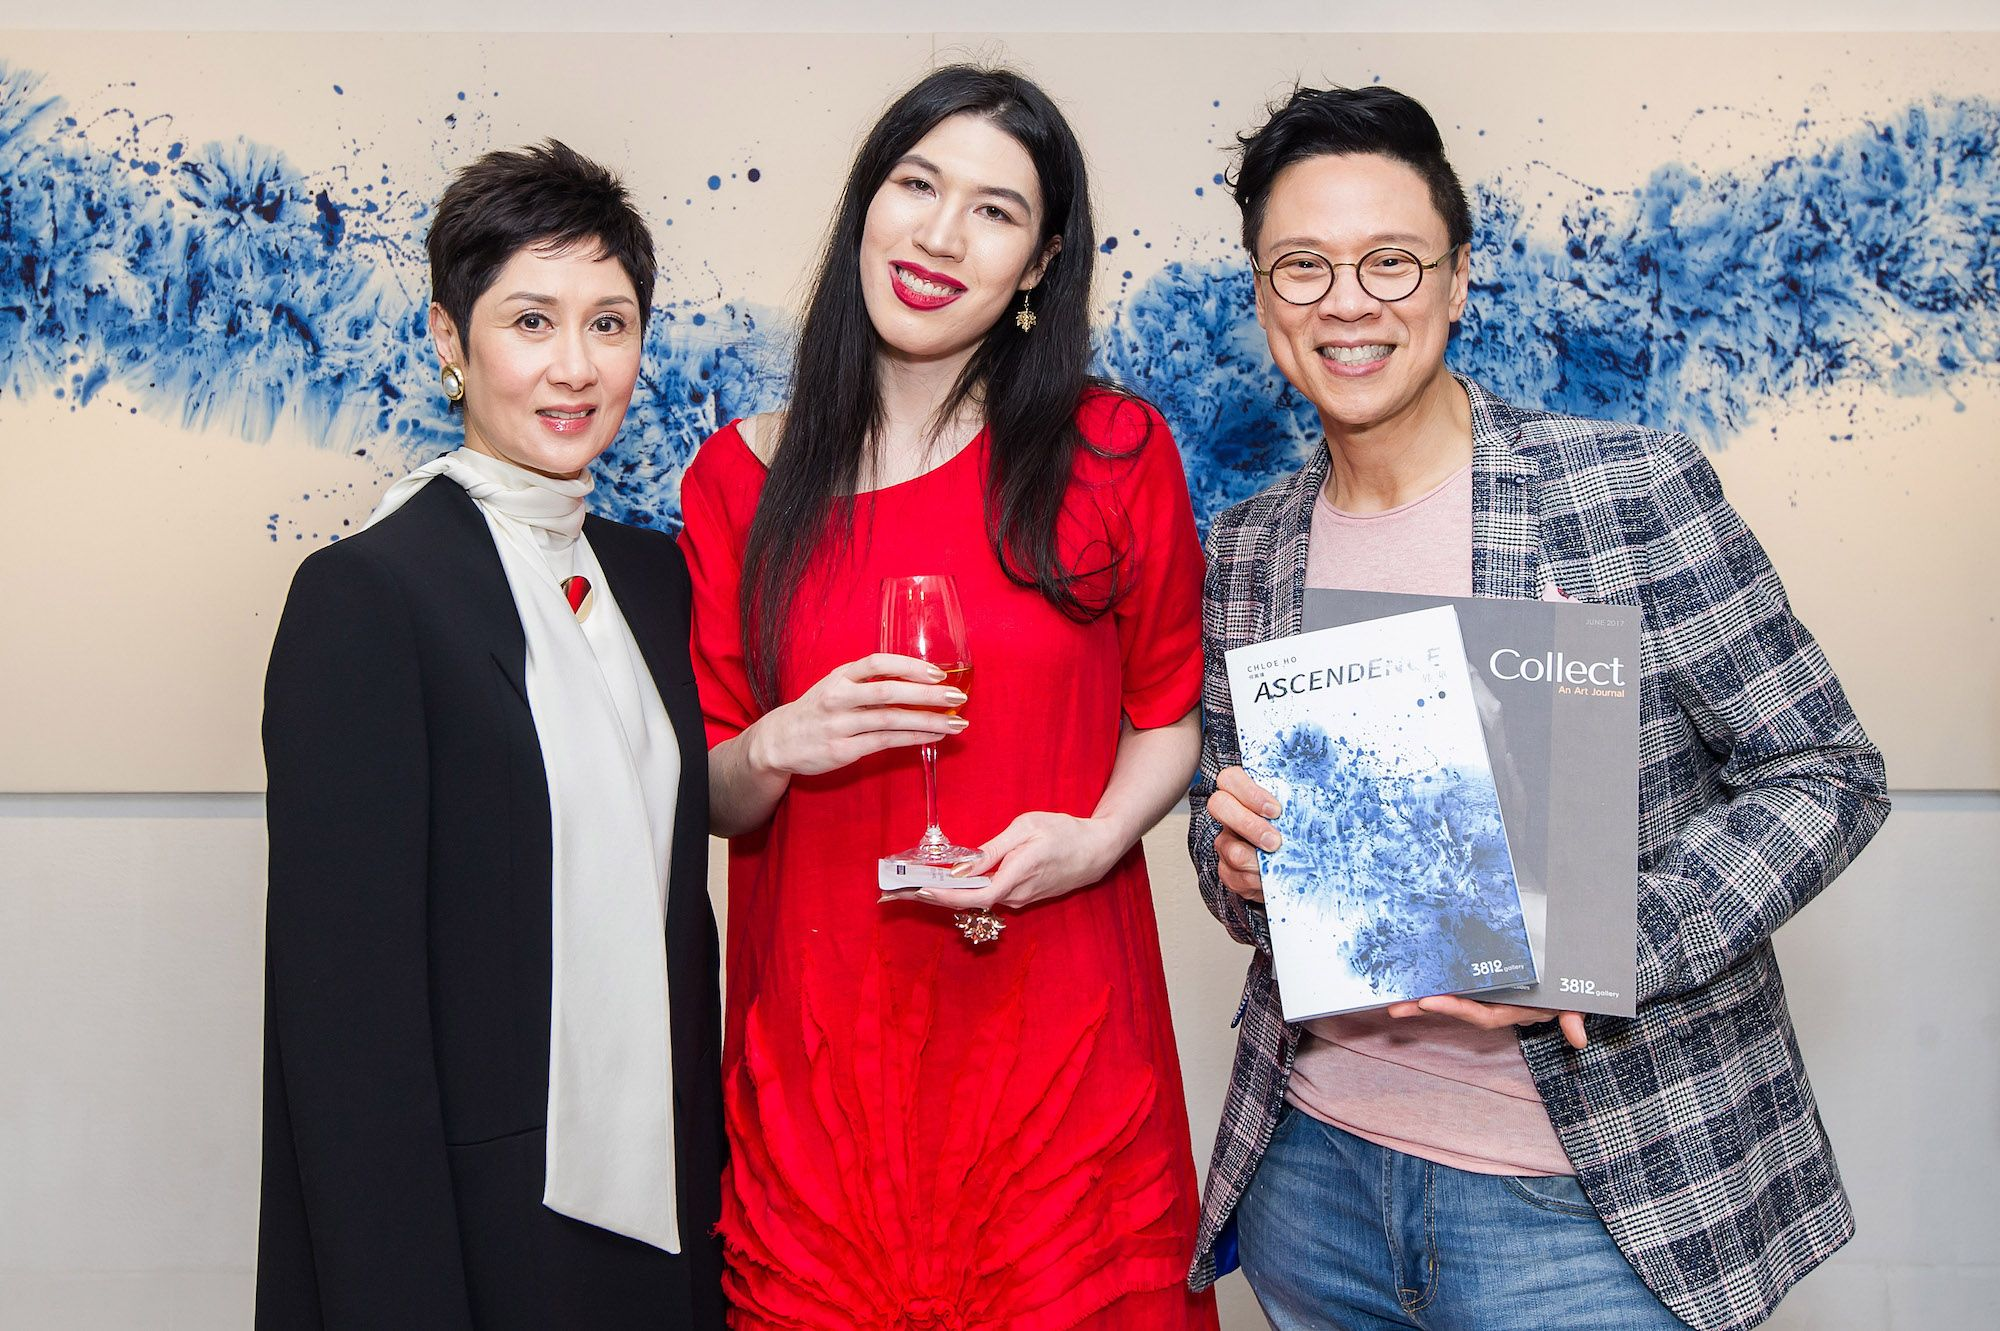 Michelle Ong, Chloe Ho, Stephen Chen